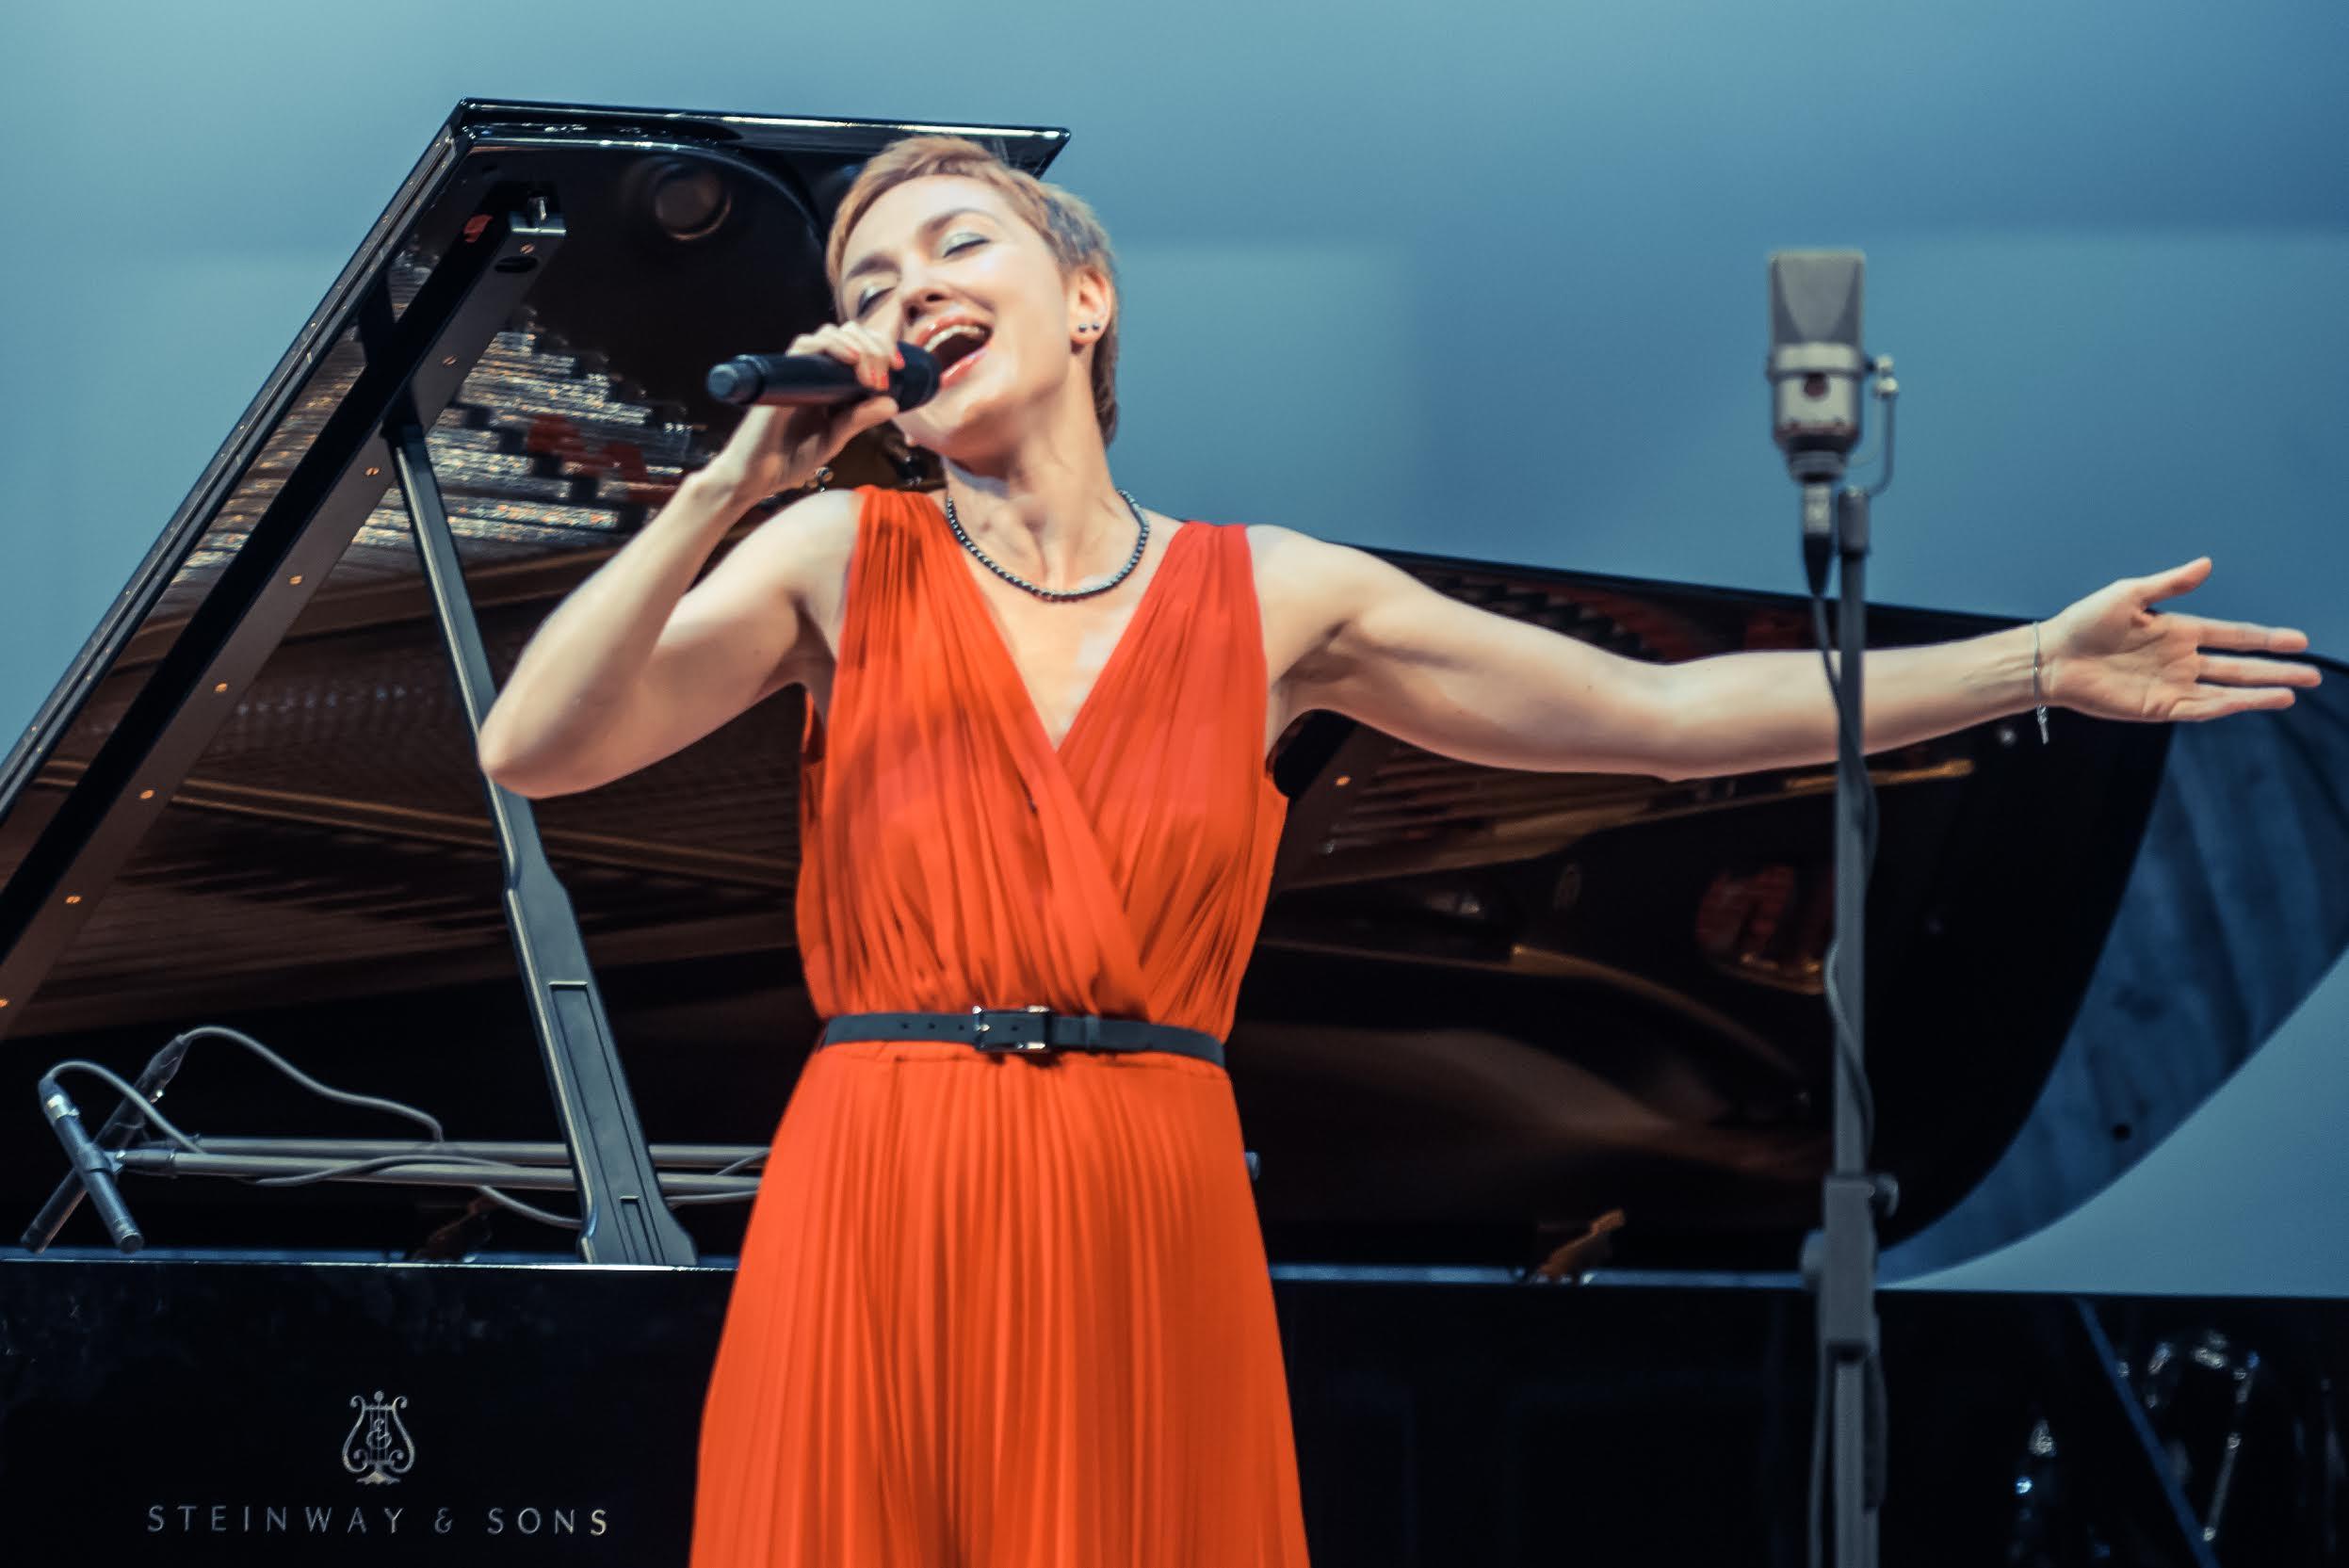 Знакомства джазовая певица москва знакомства один, два раза онлайн.тверь